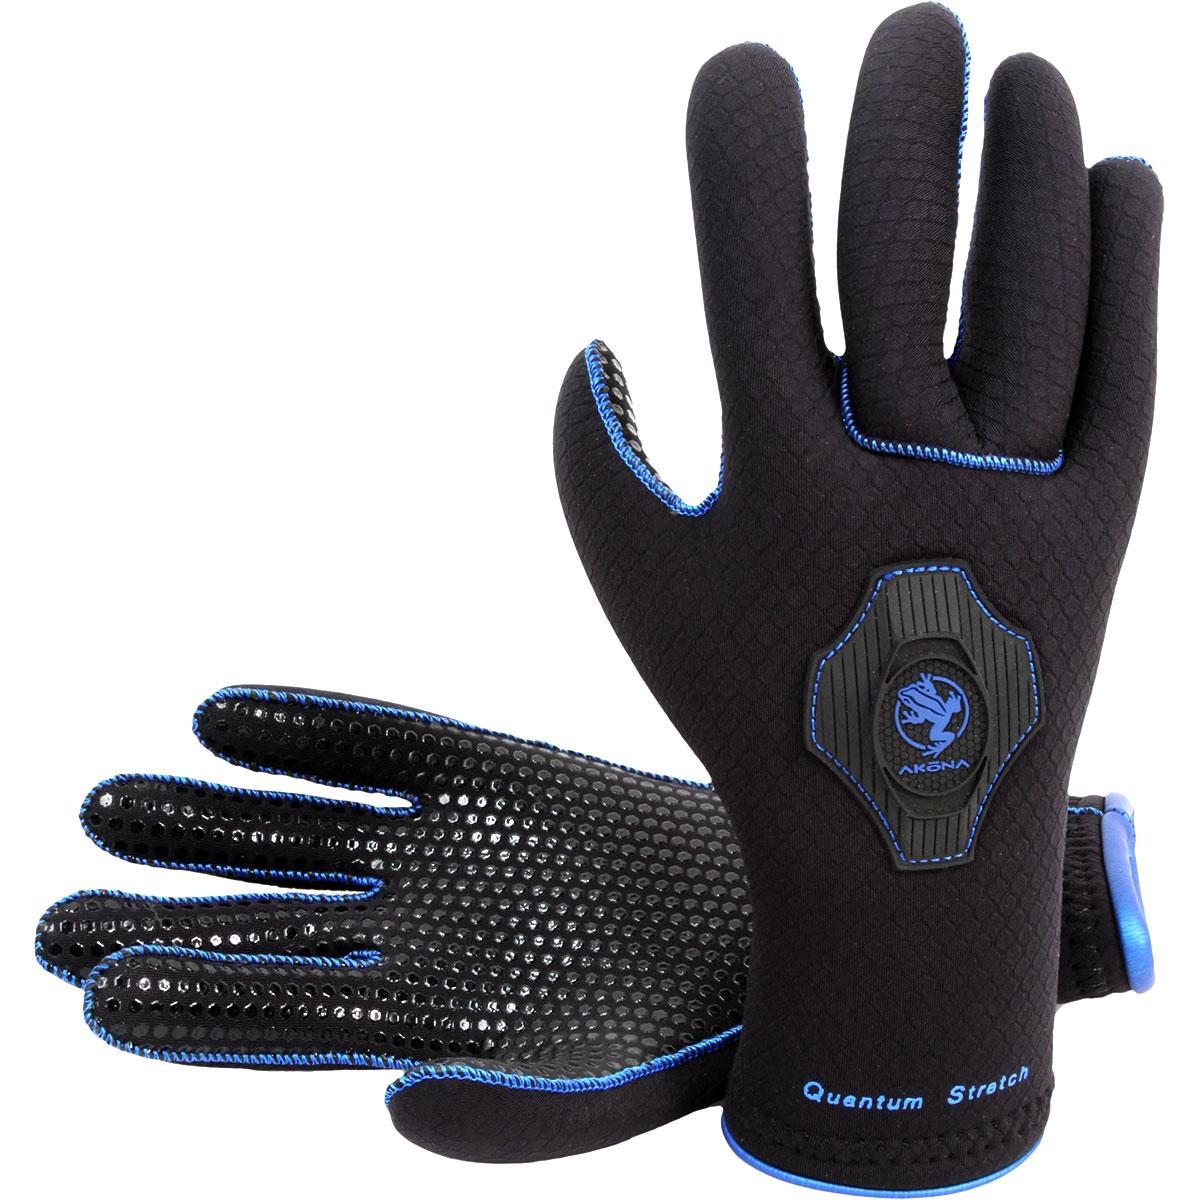 Akona 3.5mm Quantum Stretch Glove LG AKNG436